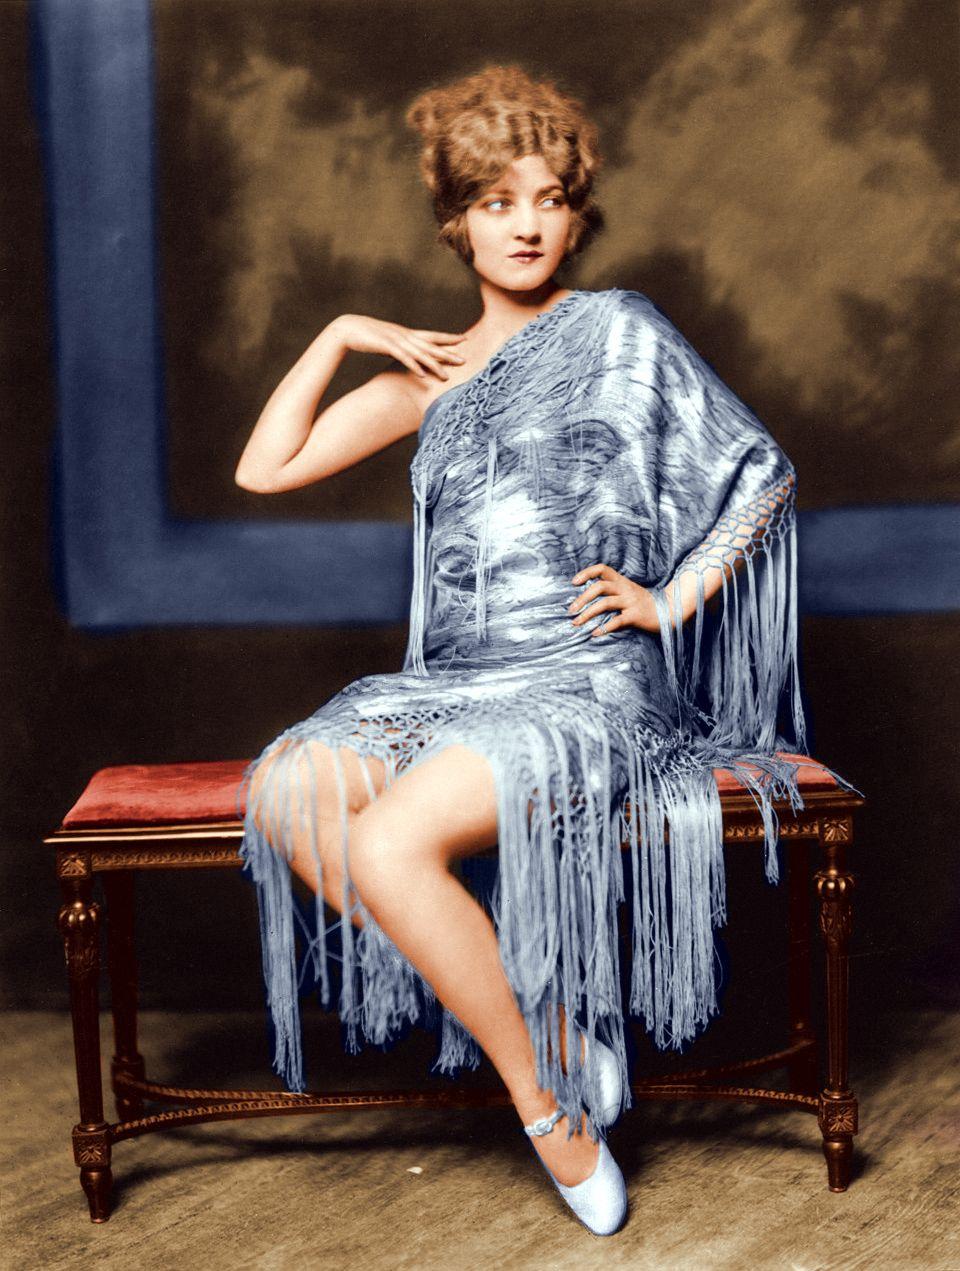 Ackerman, Bernice Mujer fotografia, Glamour de